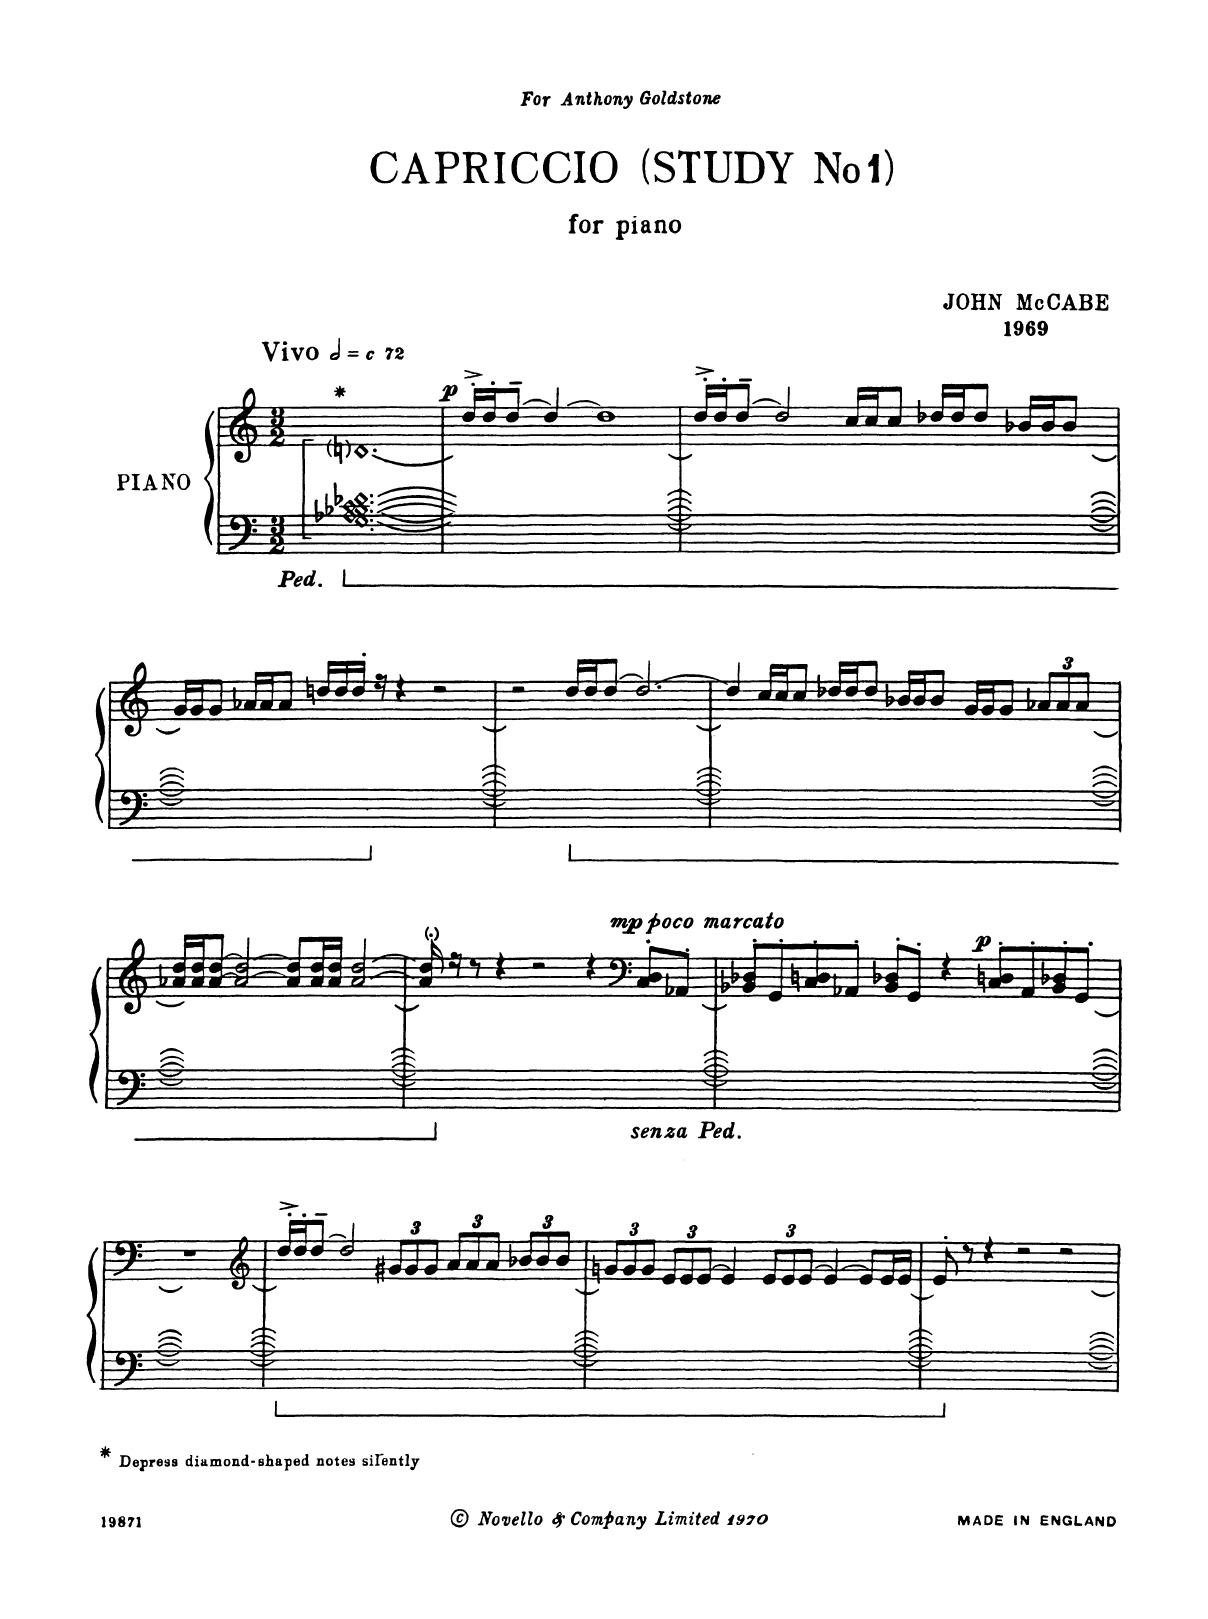 John McCabe - Capriccio (Study No. 1)